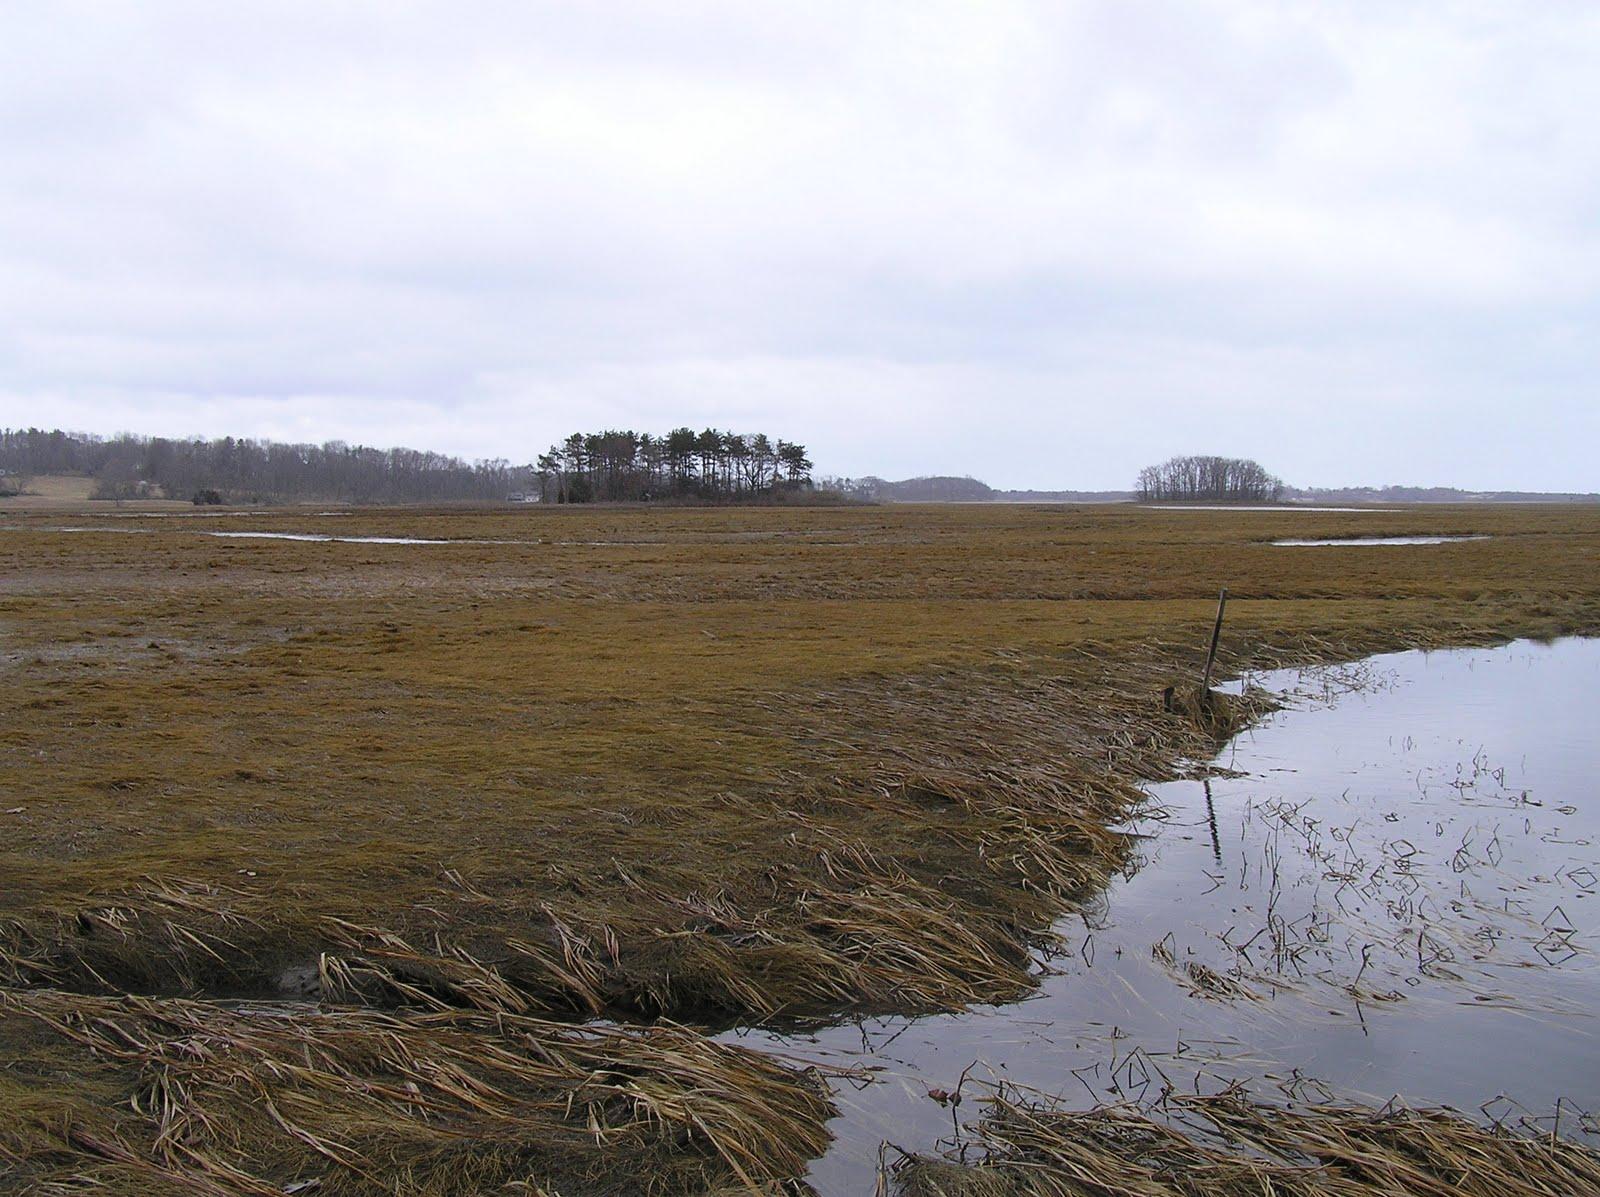 On the Land: Ipswich Salt Marsh CRs